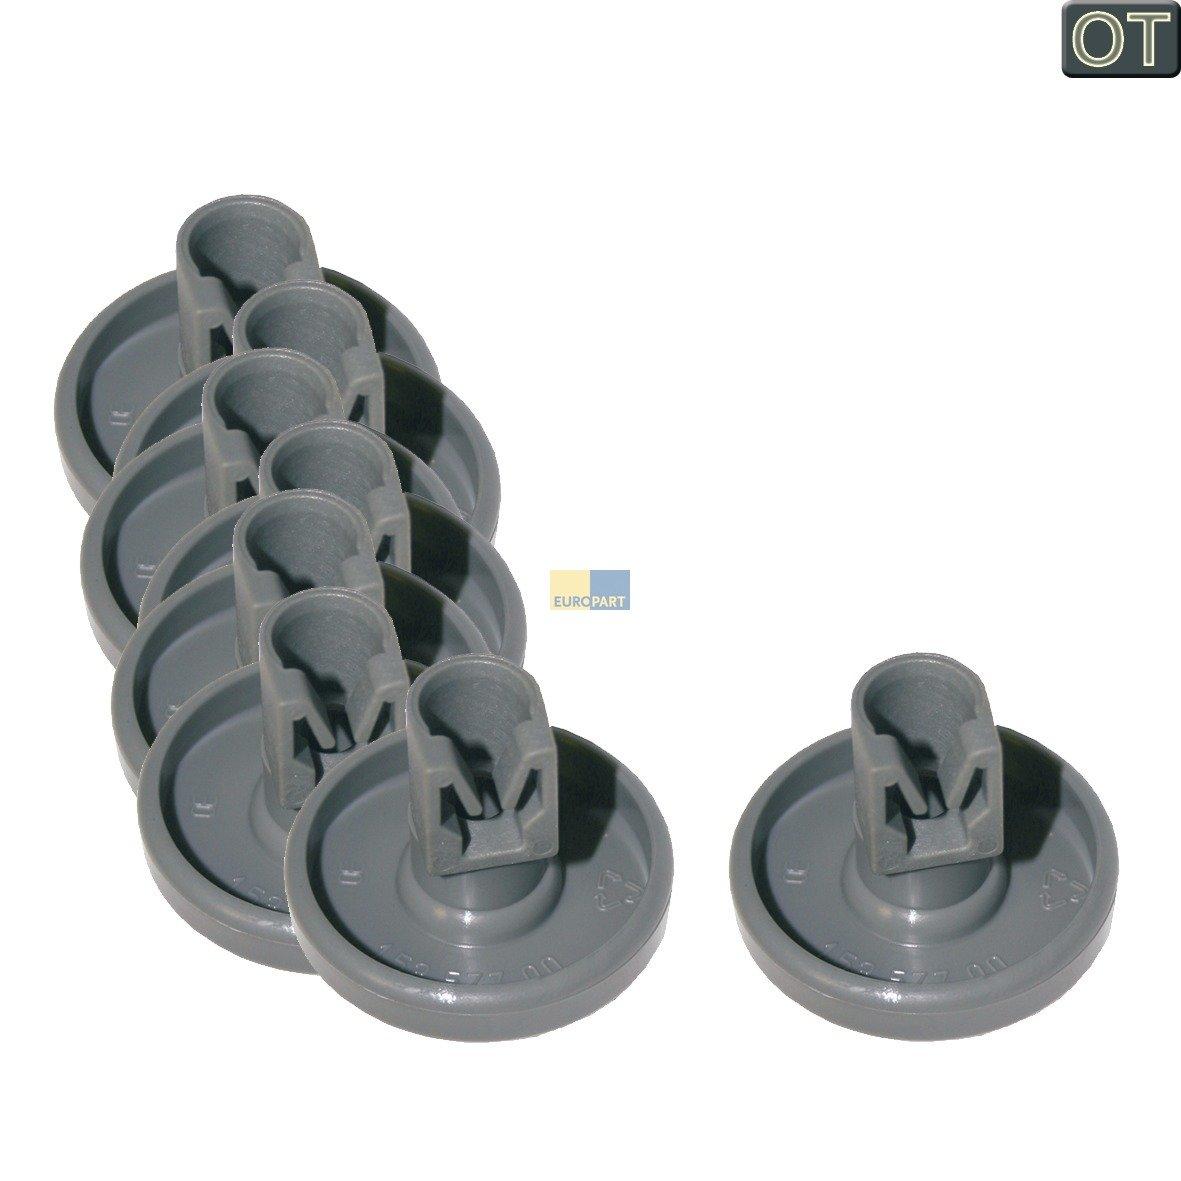 AEG 50286965004 Basket Rolling Baskets 8 Piece Dishwasher AEG Electrolux Zanussi Group